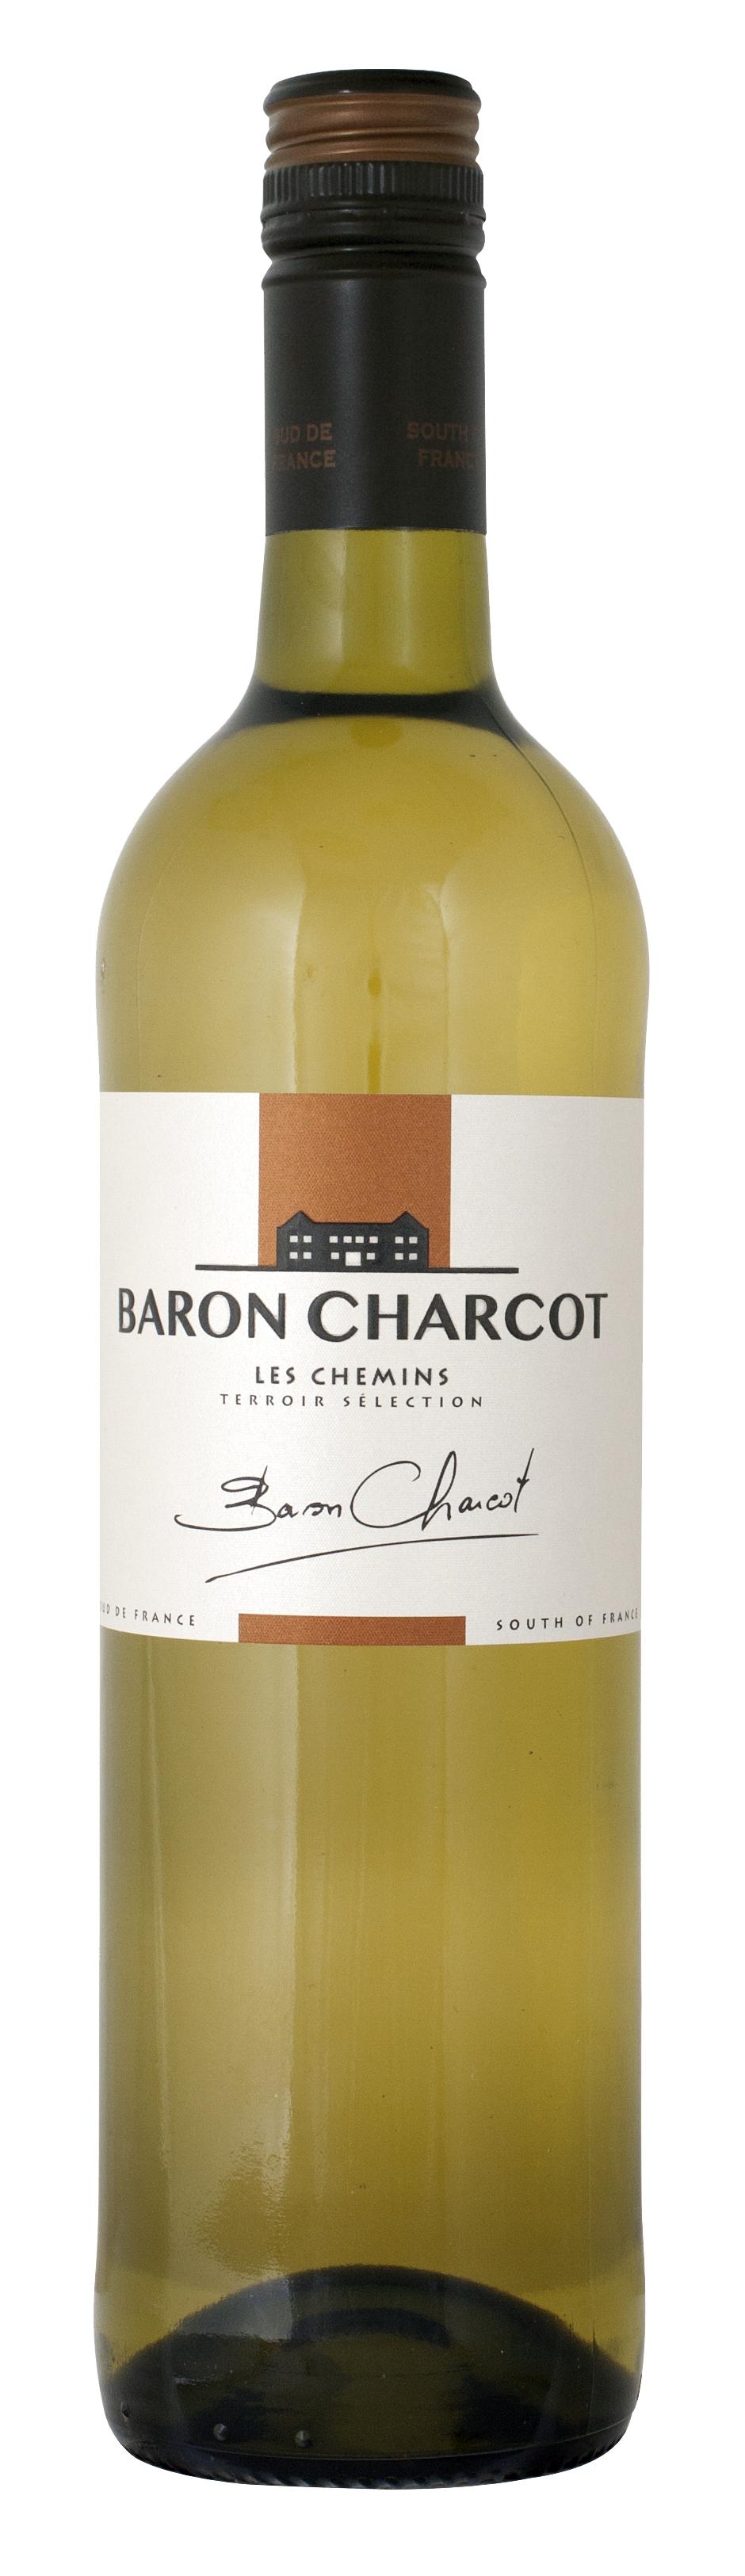 Baron Charcot Pays d'Oc Blanc